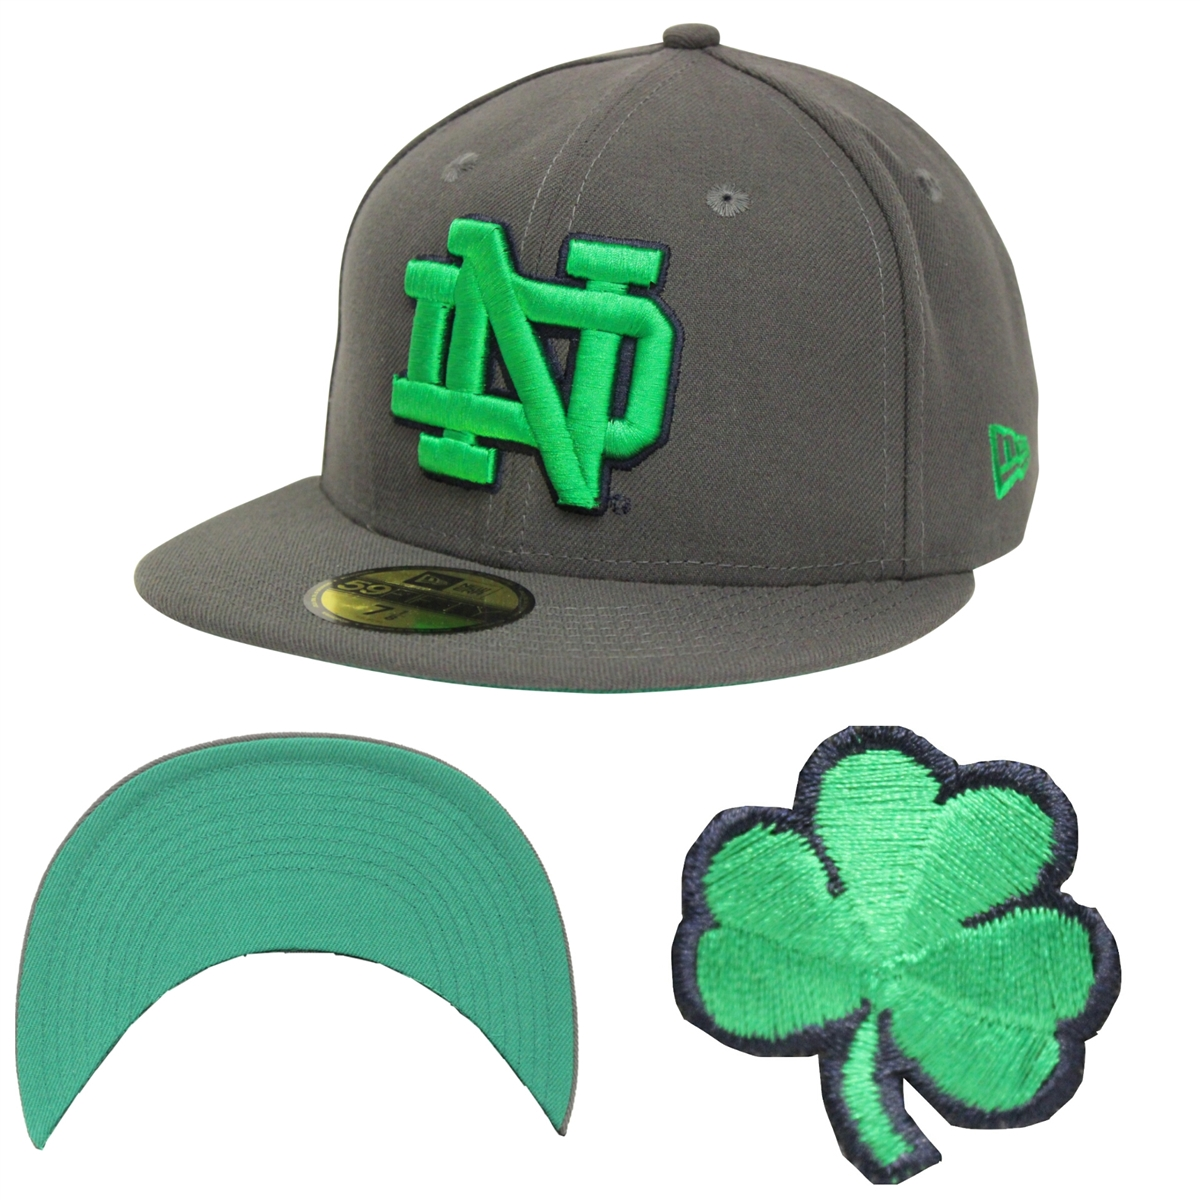 New Era 59Fifty Notre Dame Fighting Irish Graphite Fitted Cap 2dac20e9ba5